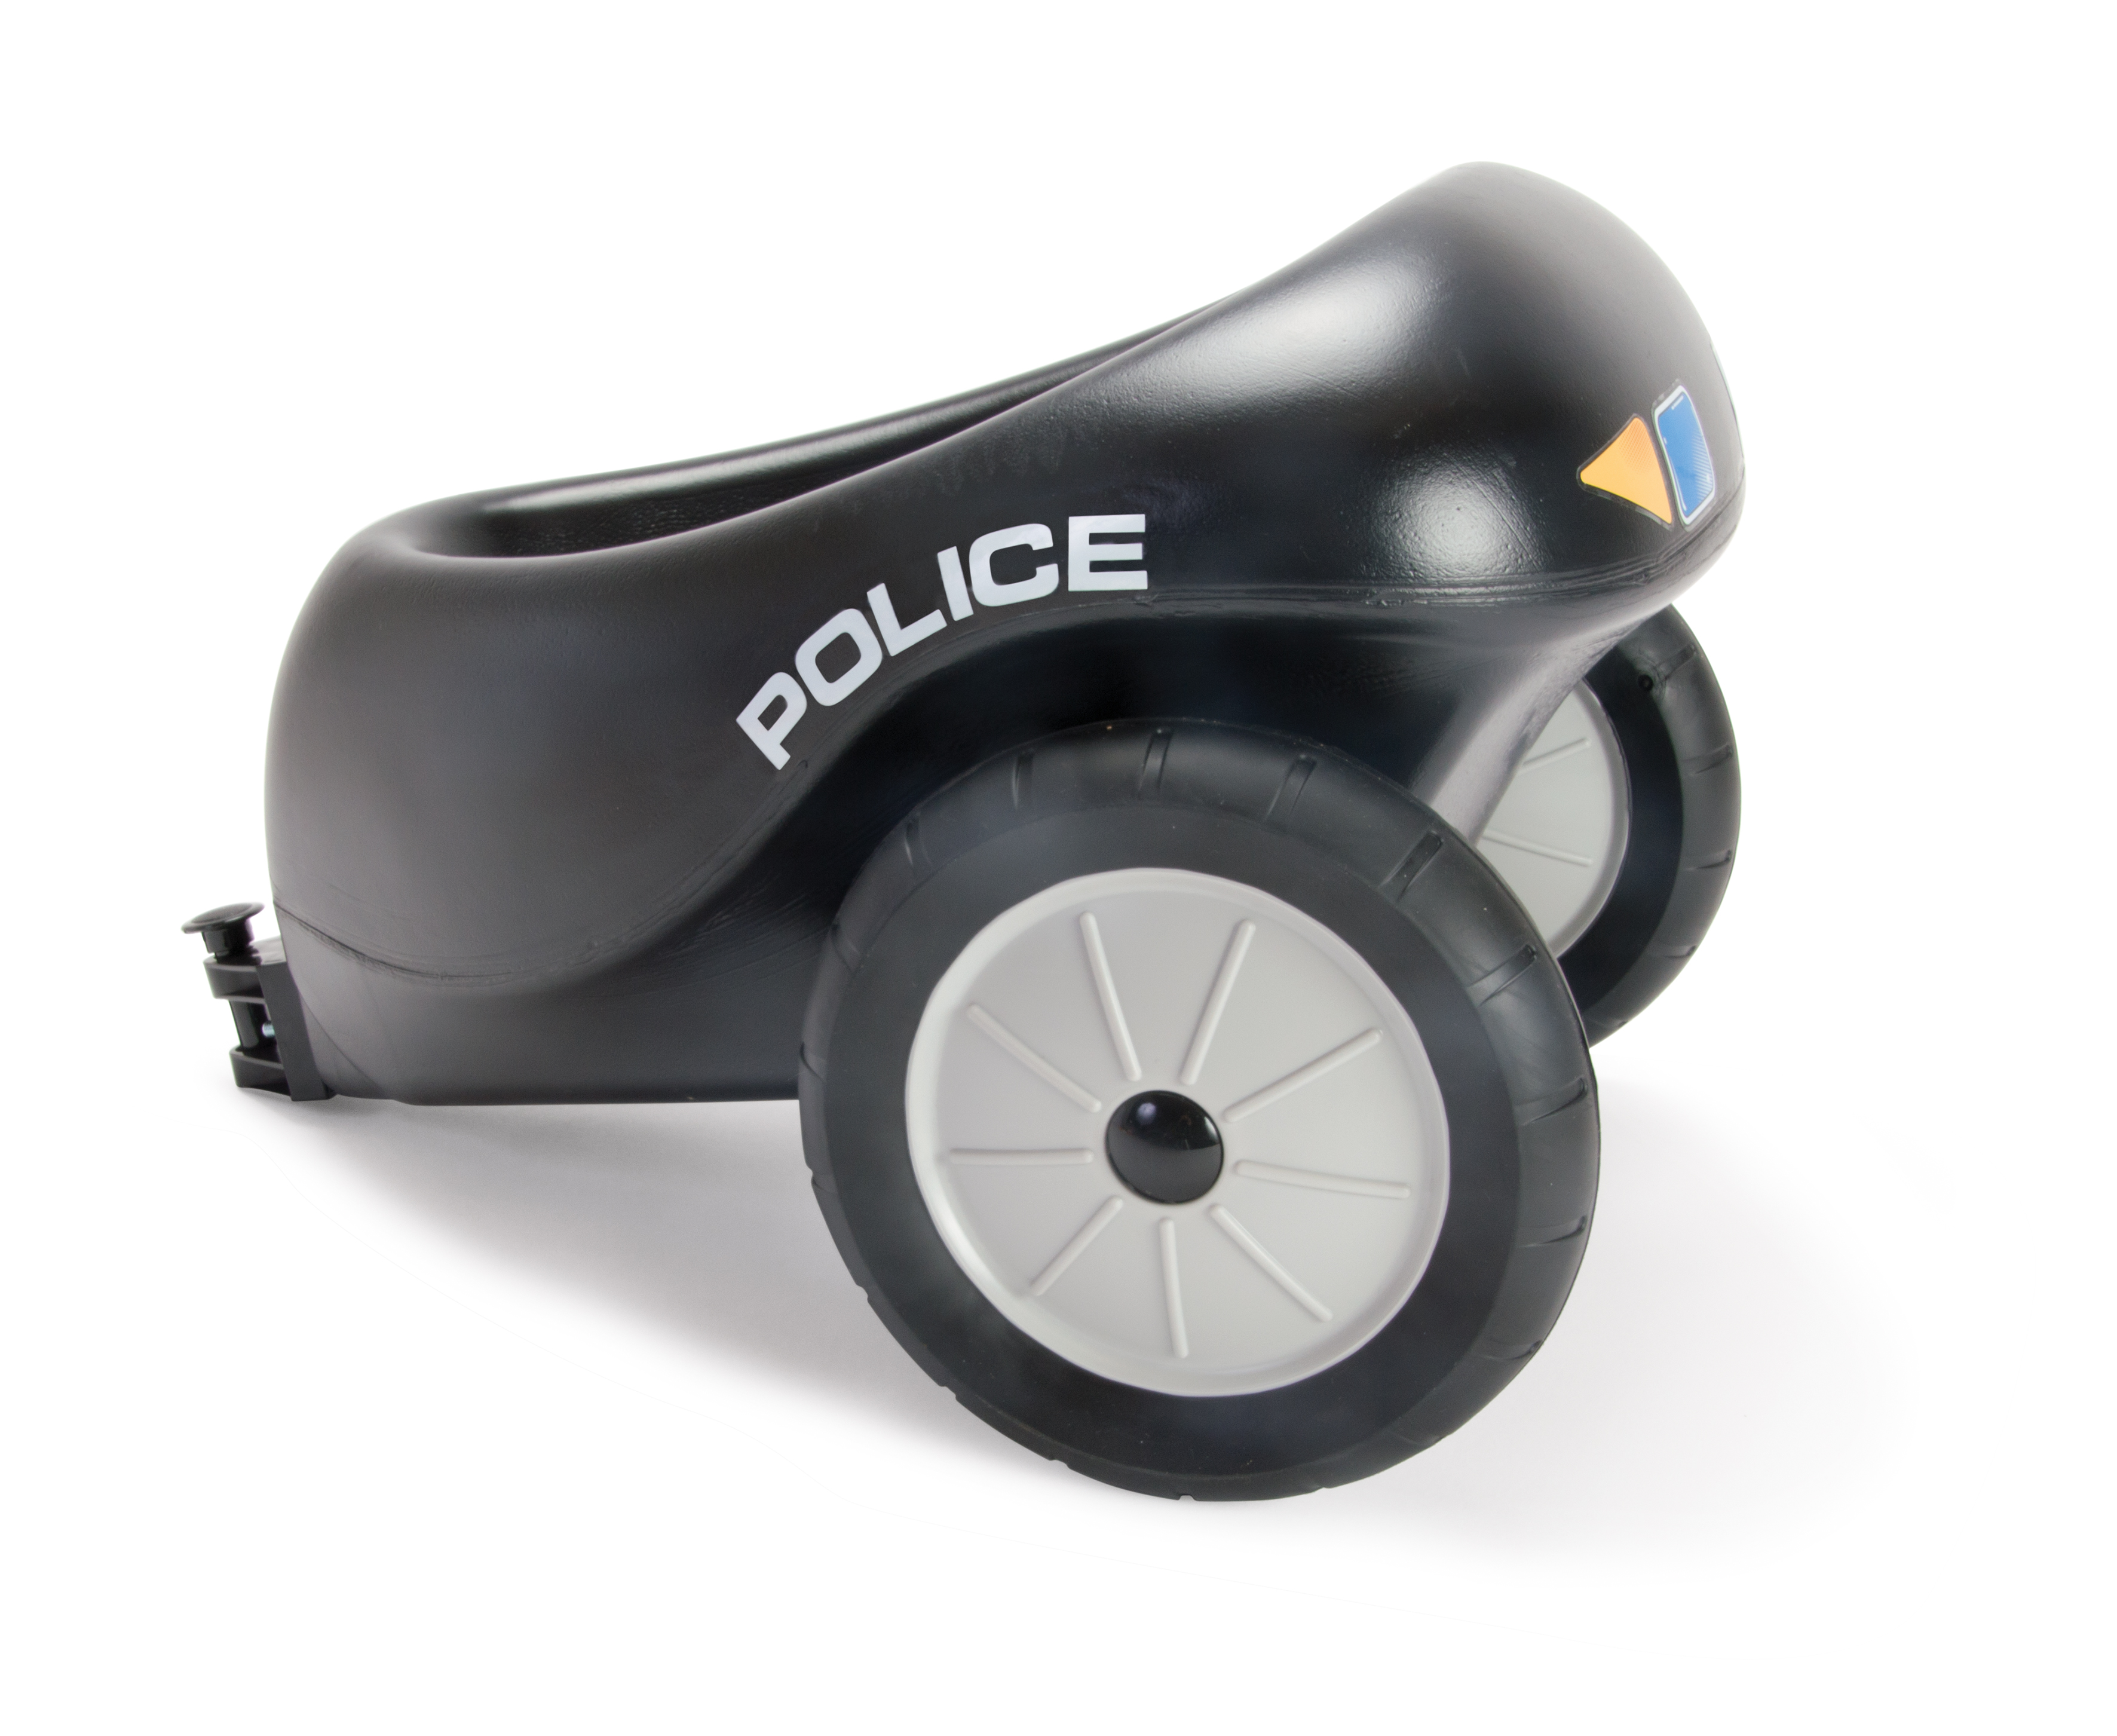 Dantoy Släpvagn med Gummihjul Polis